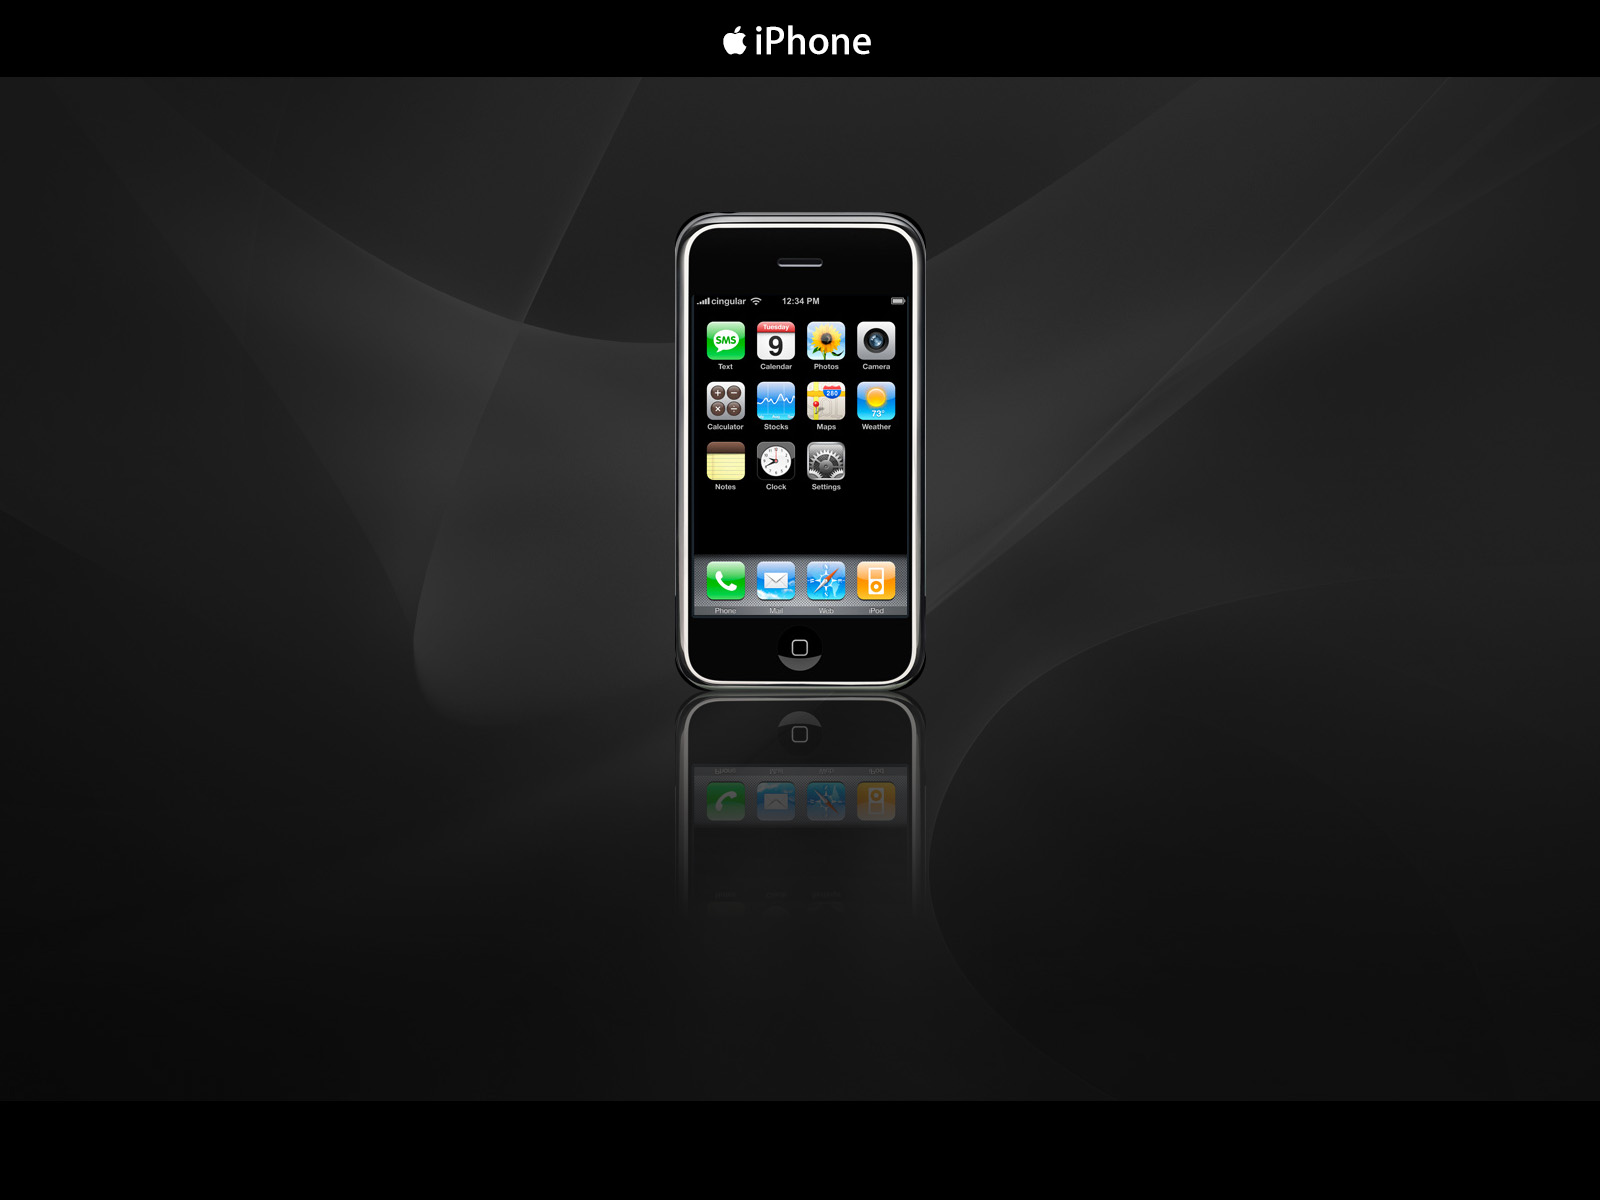 Ios 7 Iphone Wallpaper: VWallpaper IOS 7